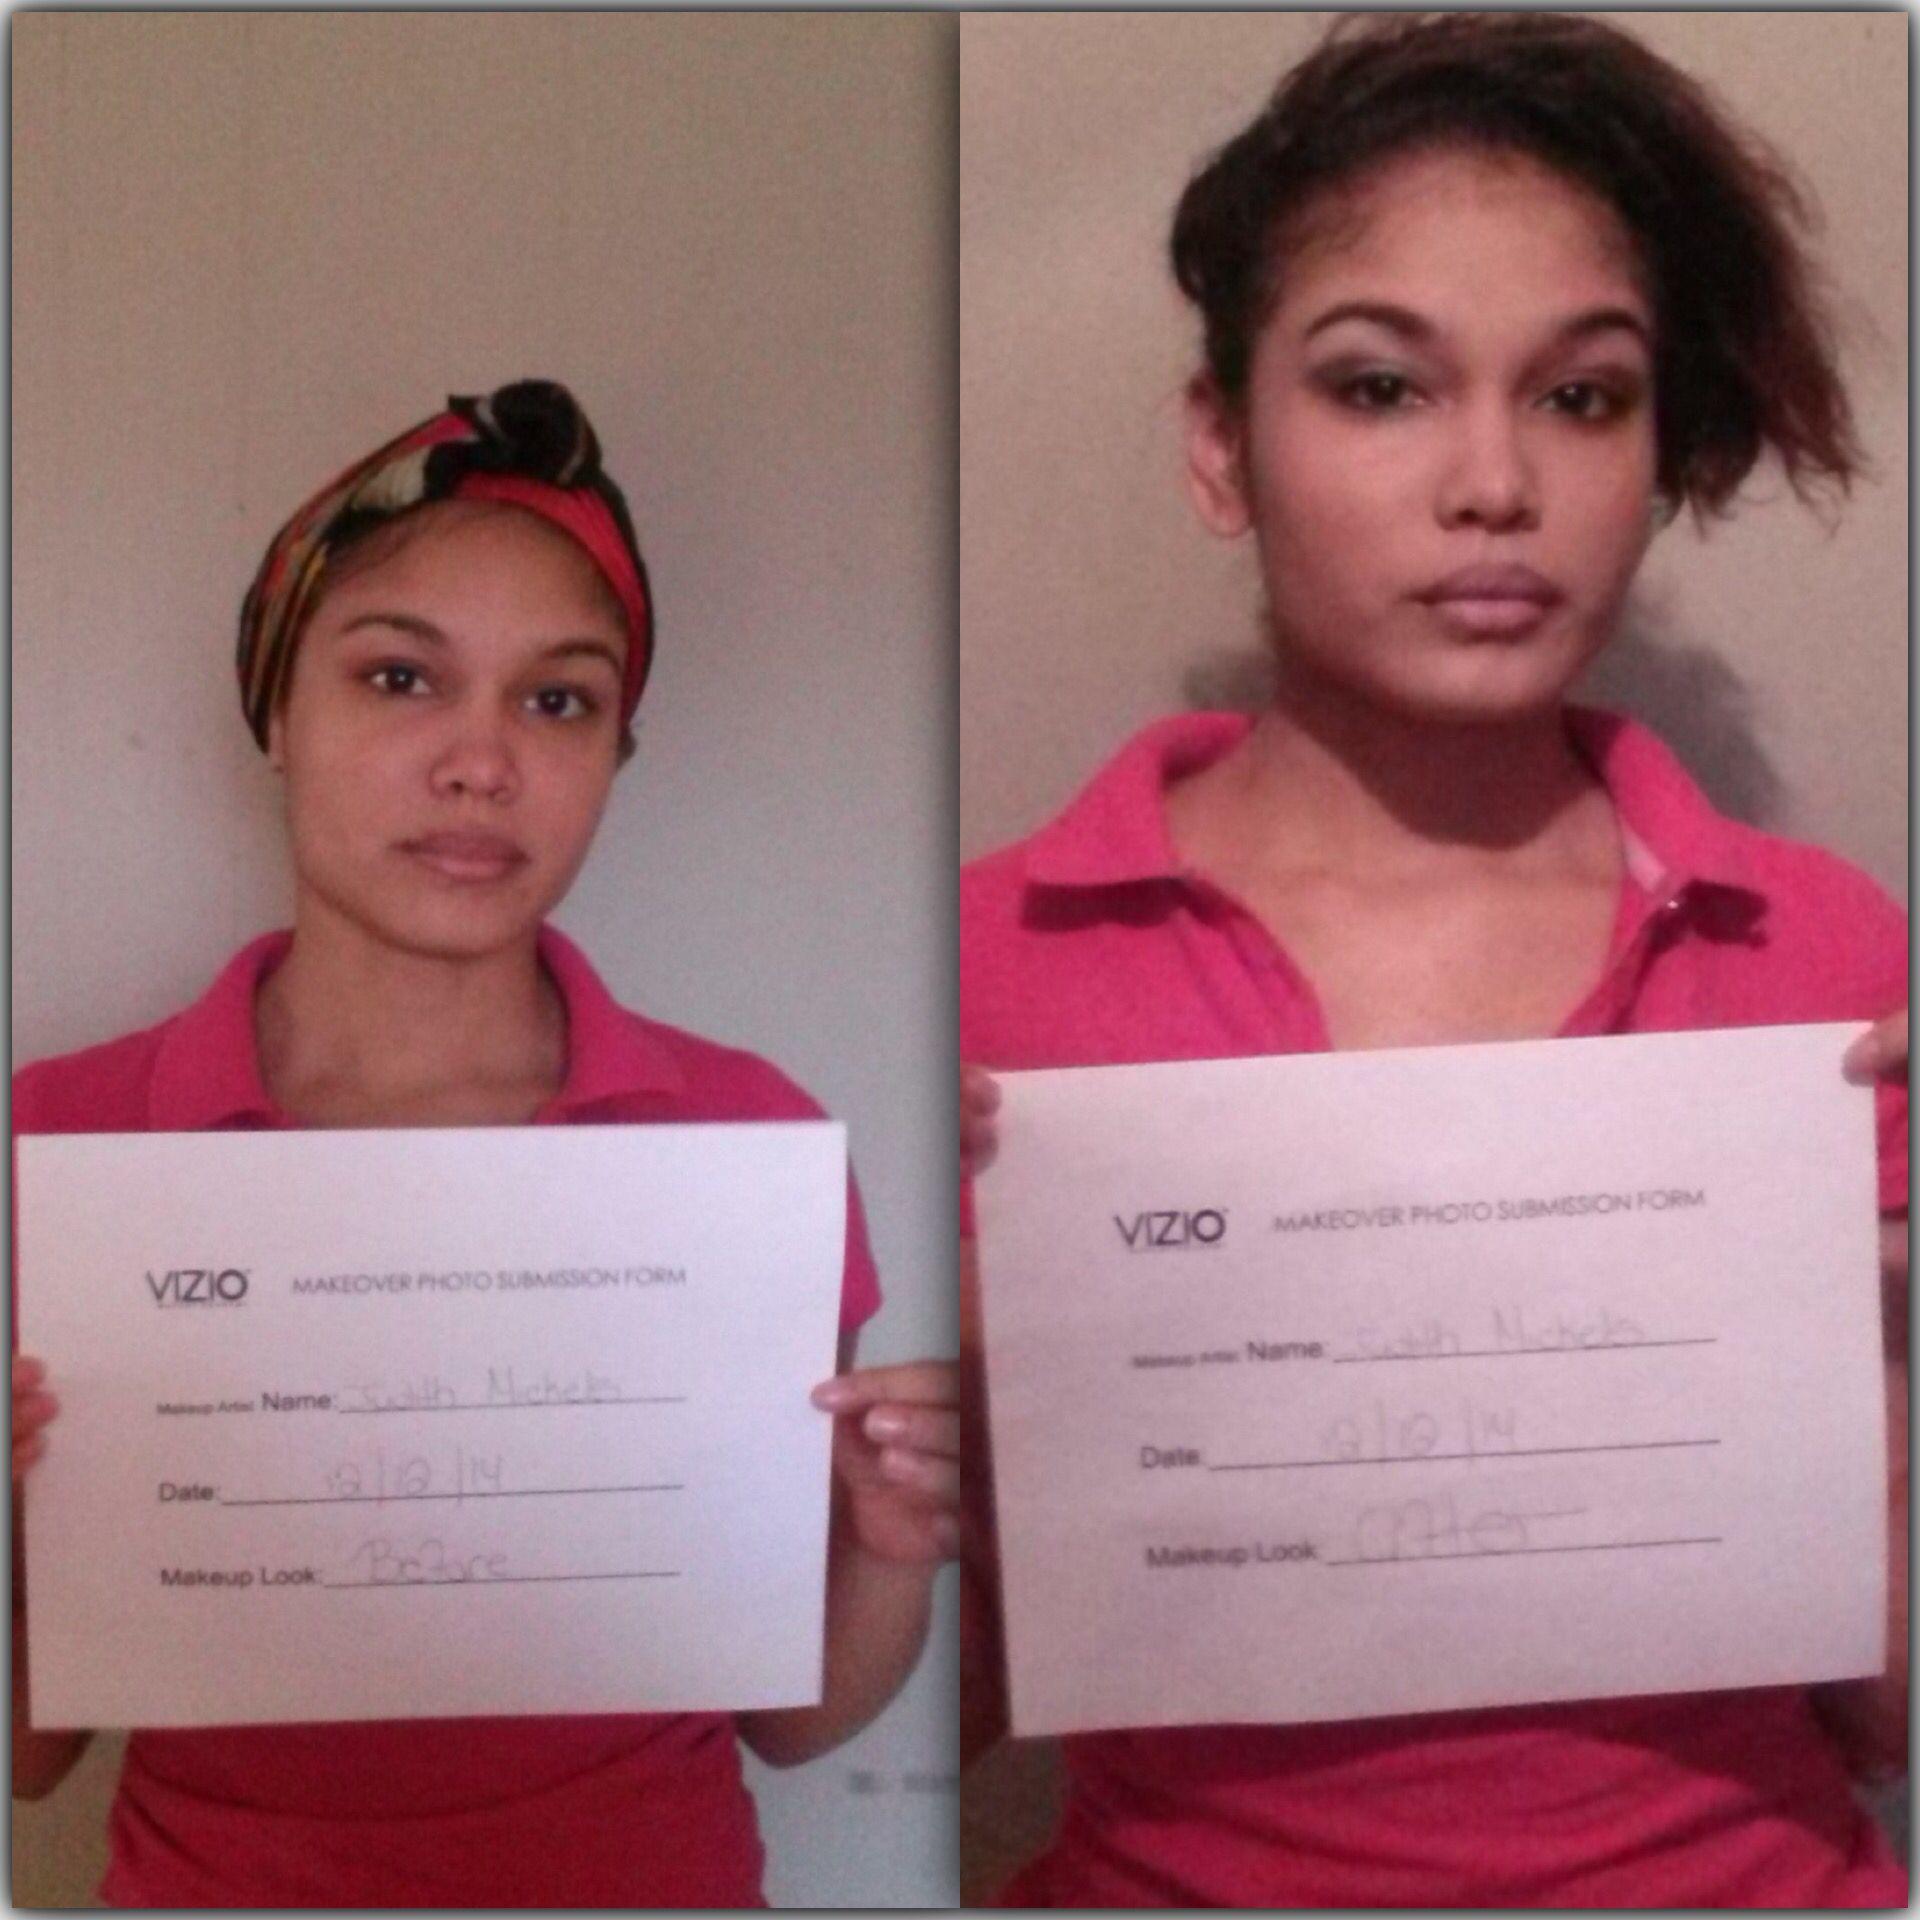 Judith Makeup Assignment Student, Vizio, Assignments